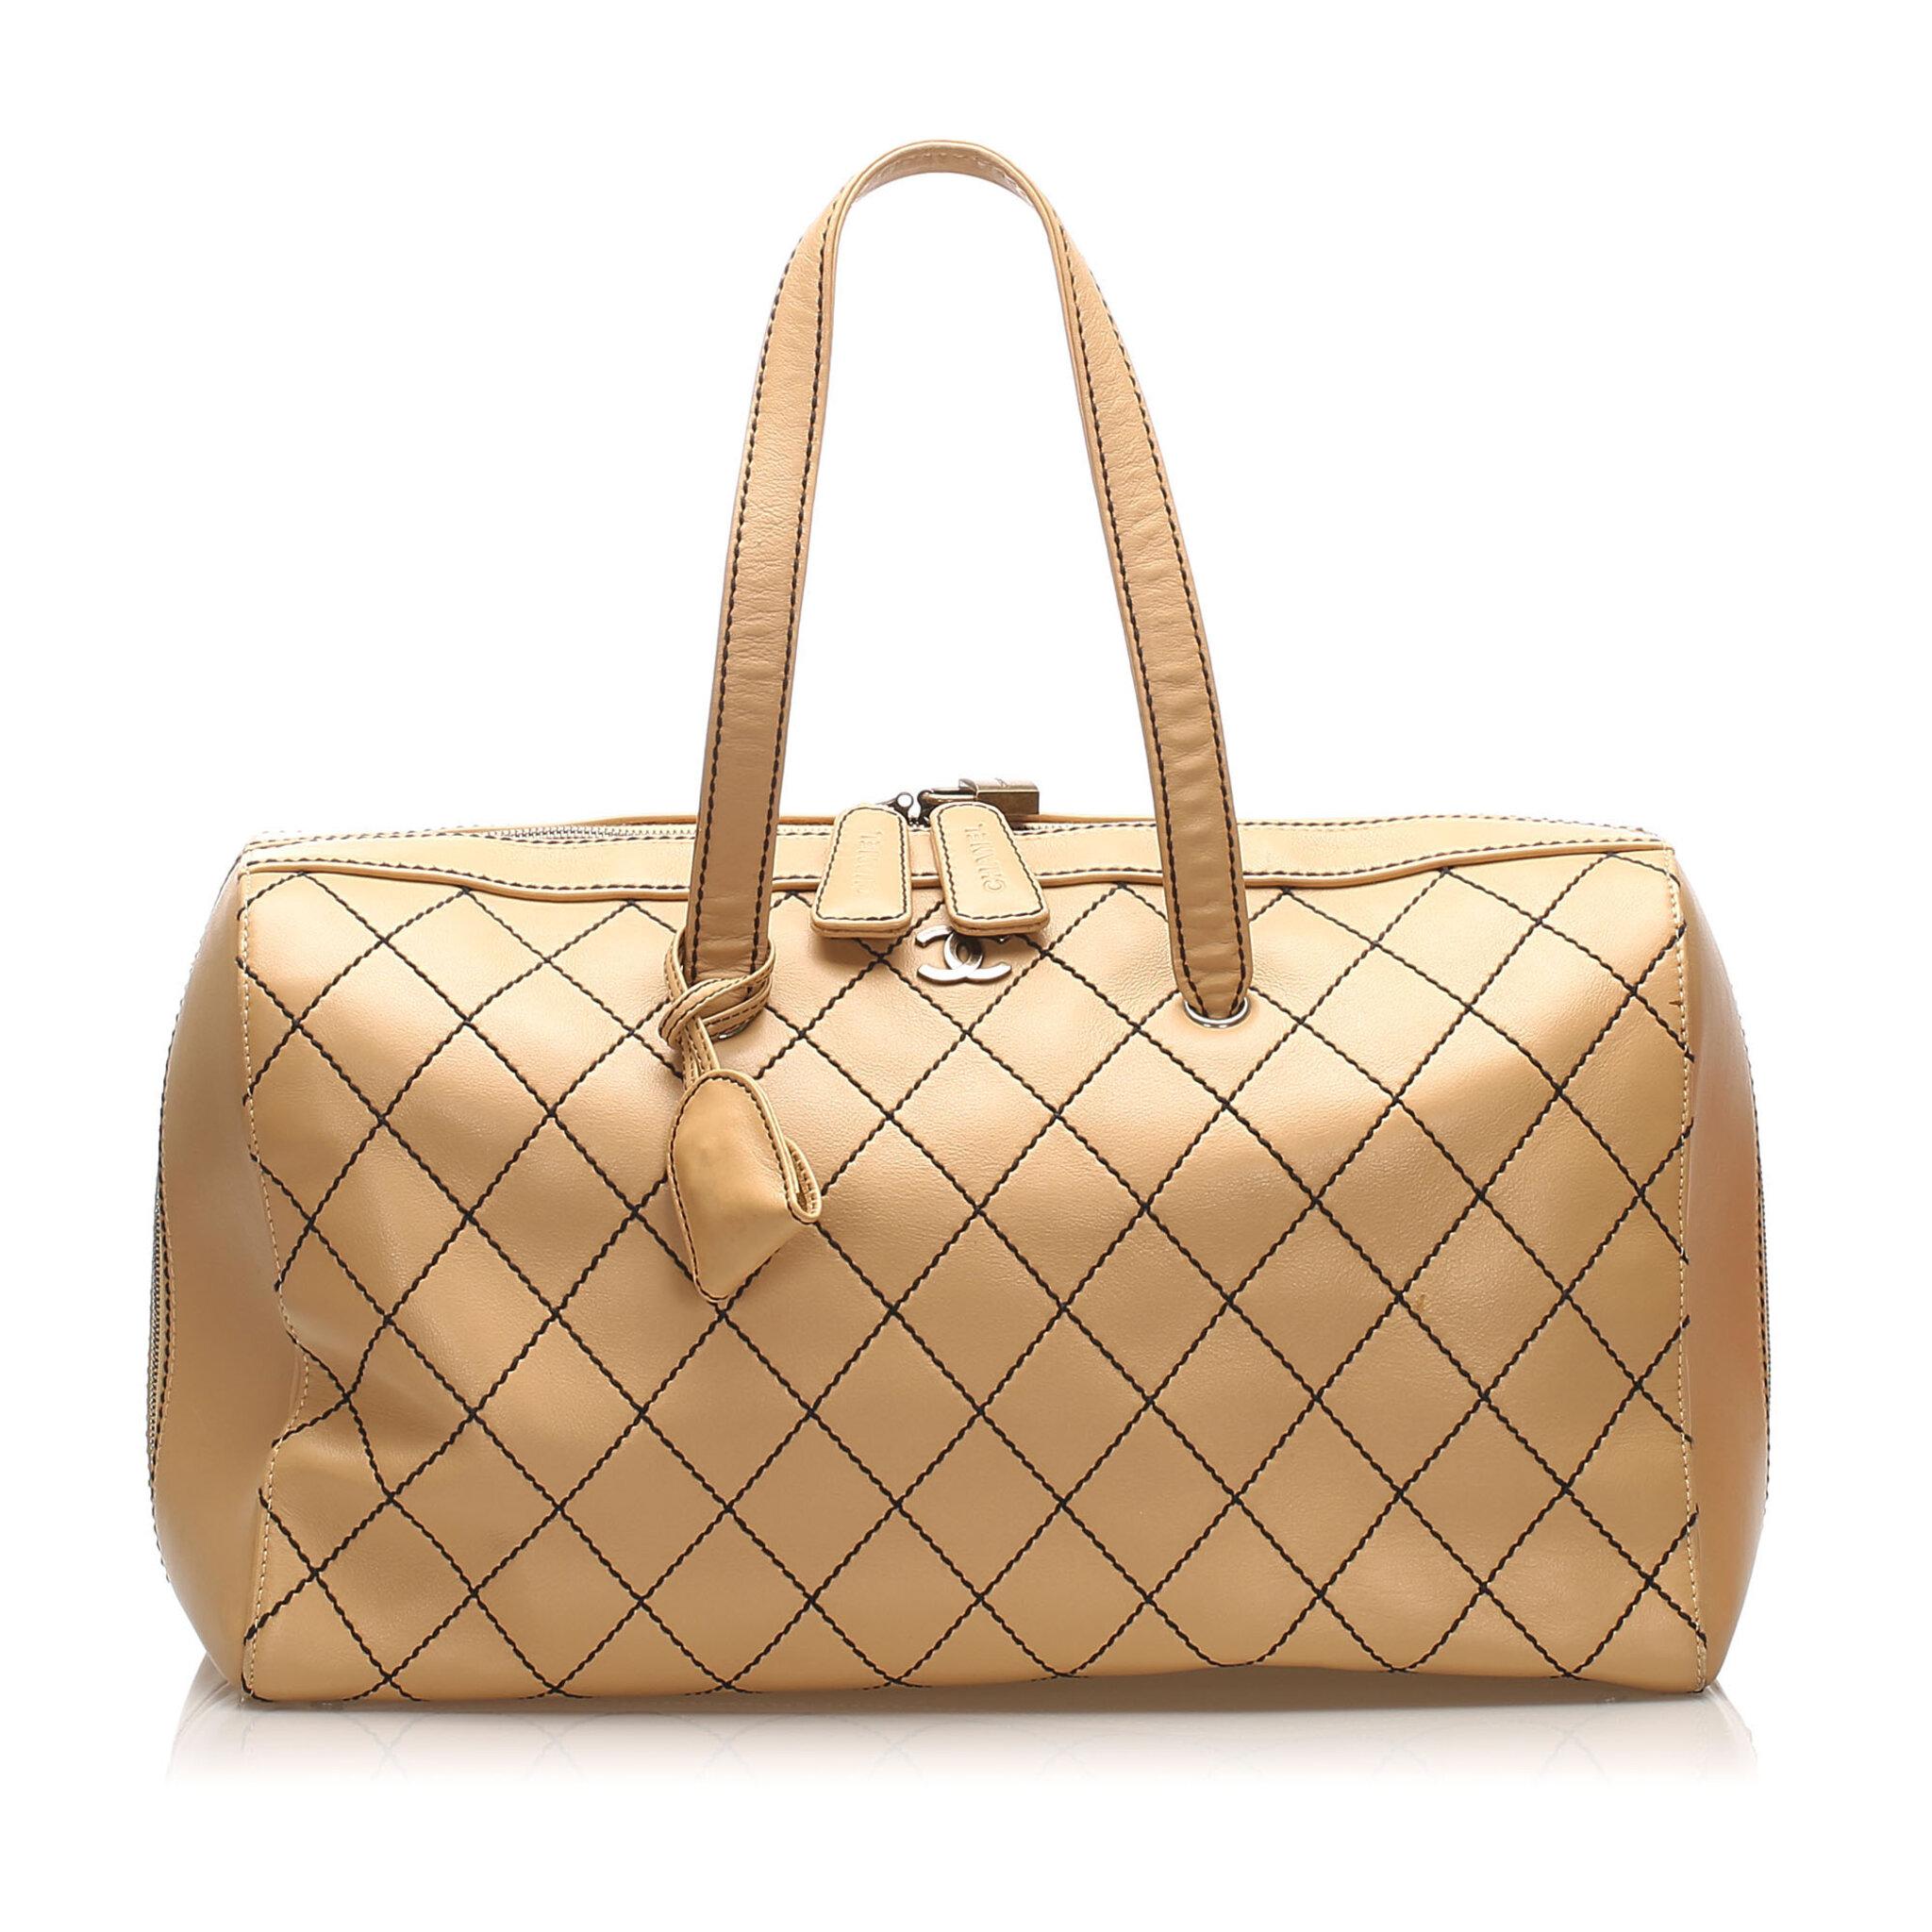 Chanel Cc Wild Stitch Leather Travel Bag